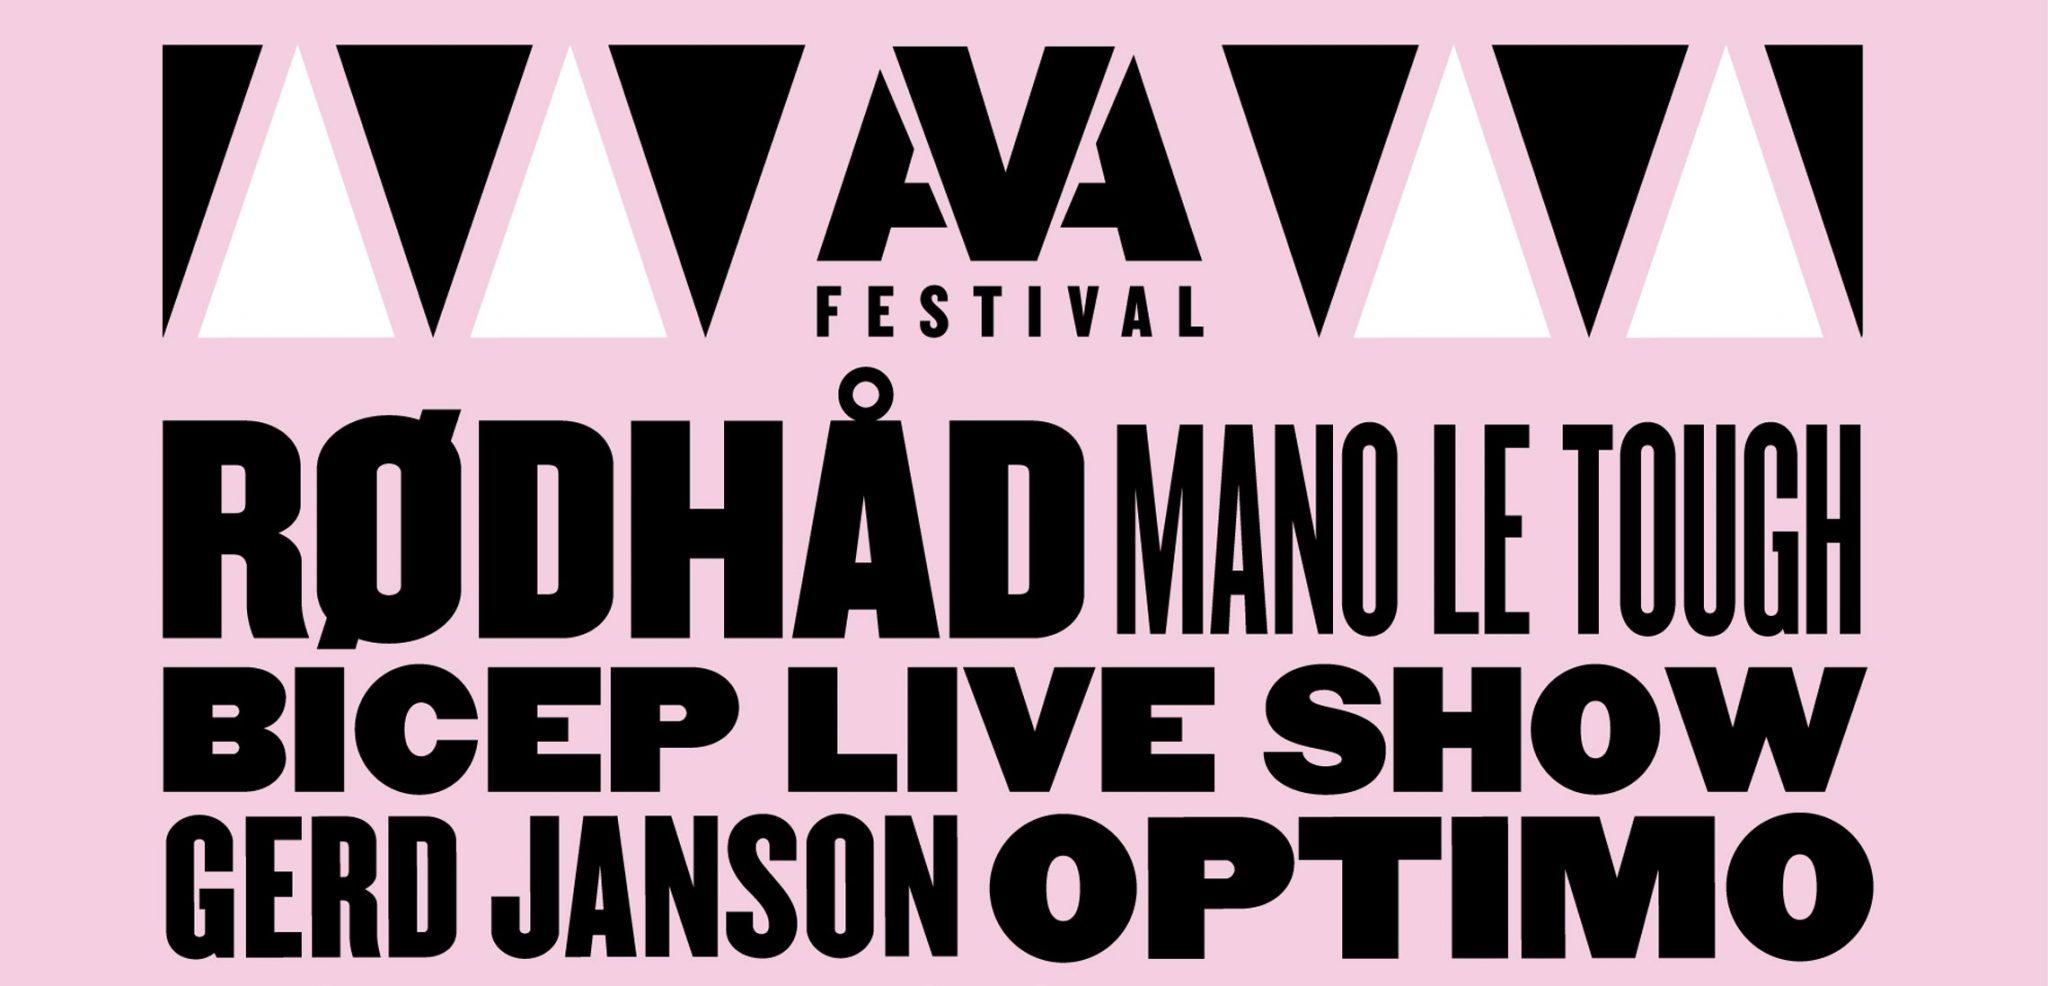 AVA Festival: Bicep LIVE Show (UK Debut), Mano Le Tough, Gerd Janson and Phil Kieran announced for 2016